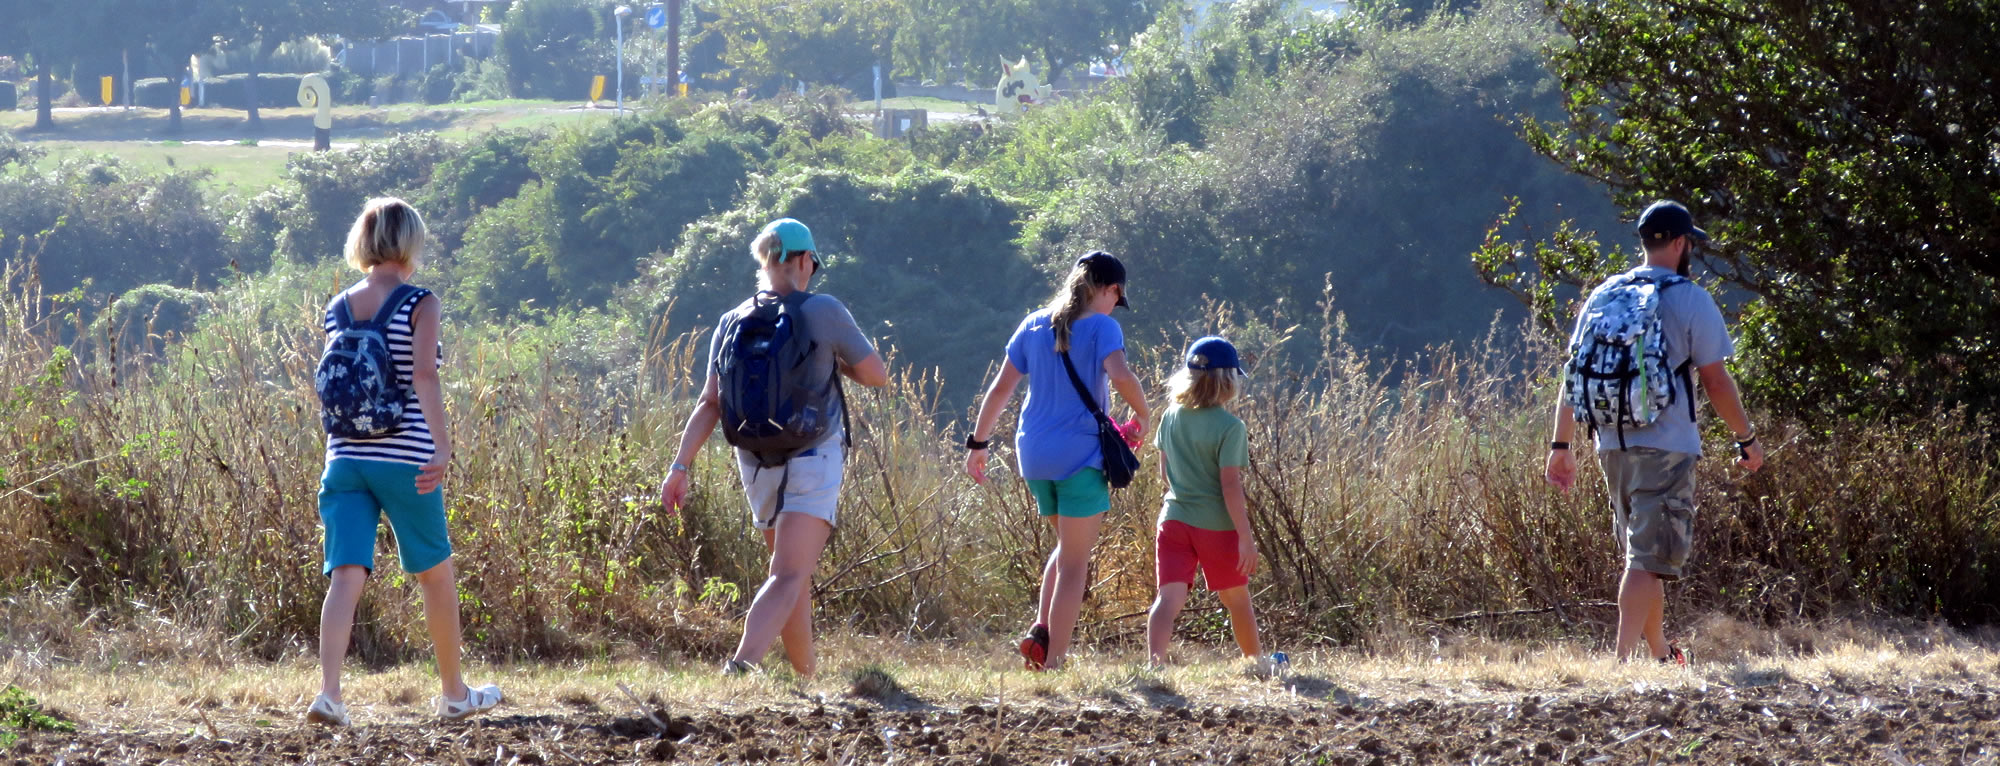 Coastal walks - Visit Ramsgate